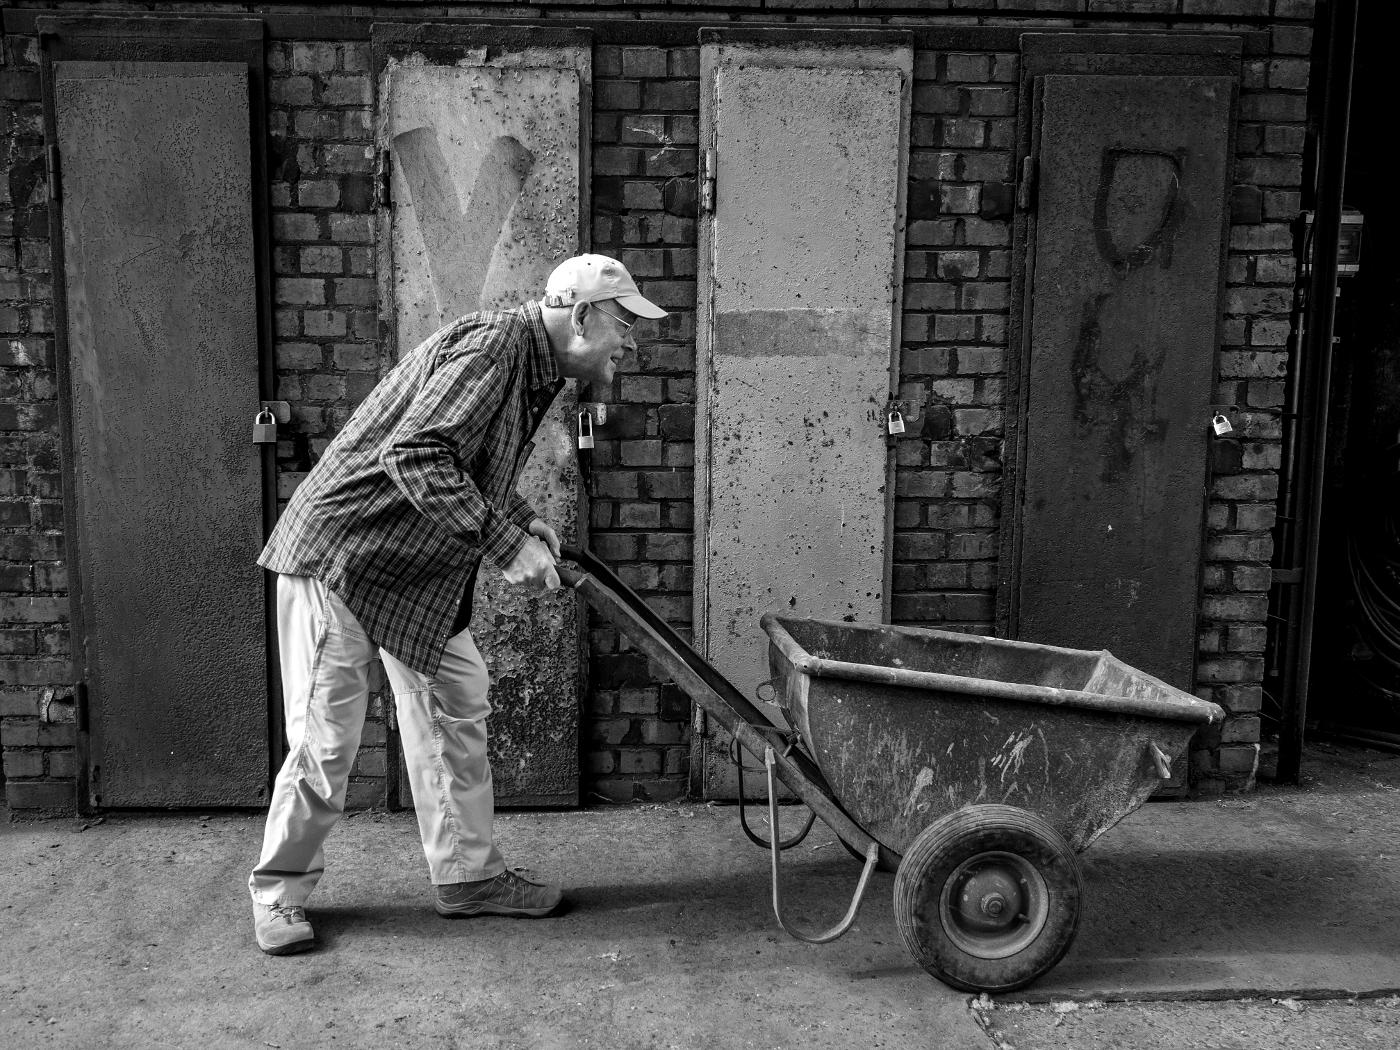 Zeche Zollverein, Man at work | © wolfgang röser | worobo